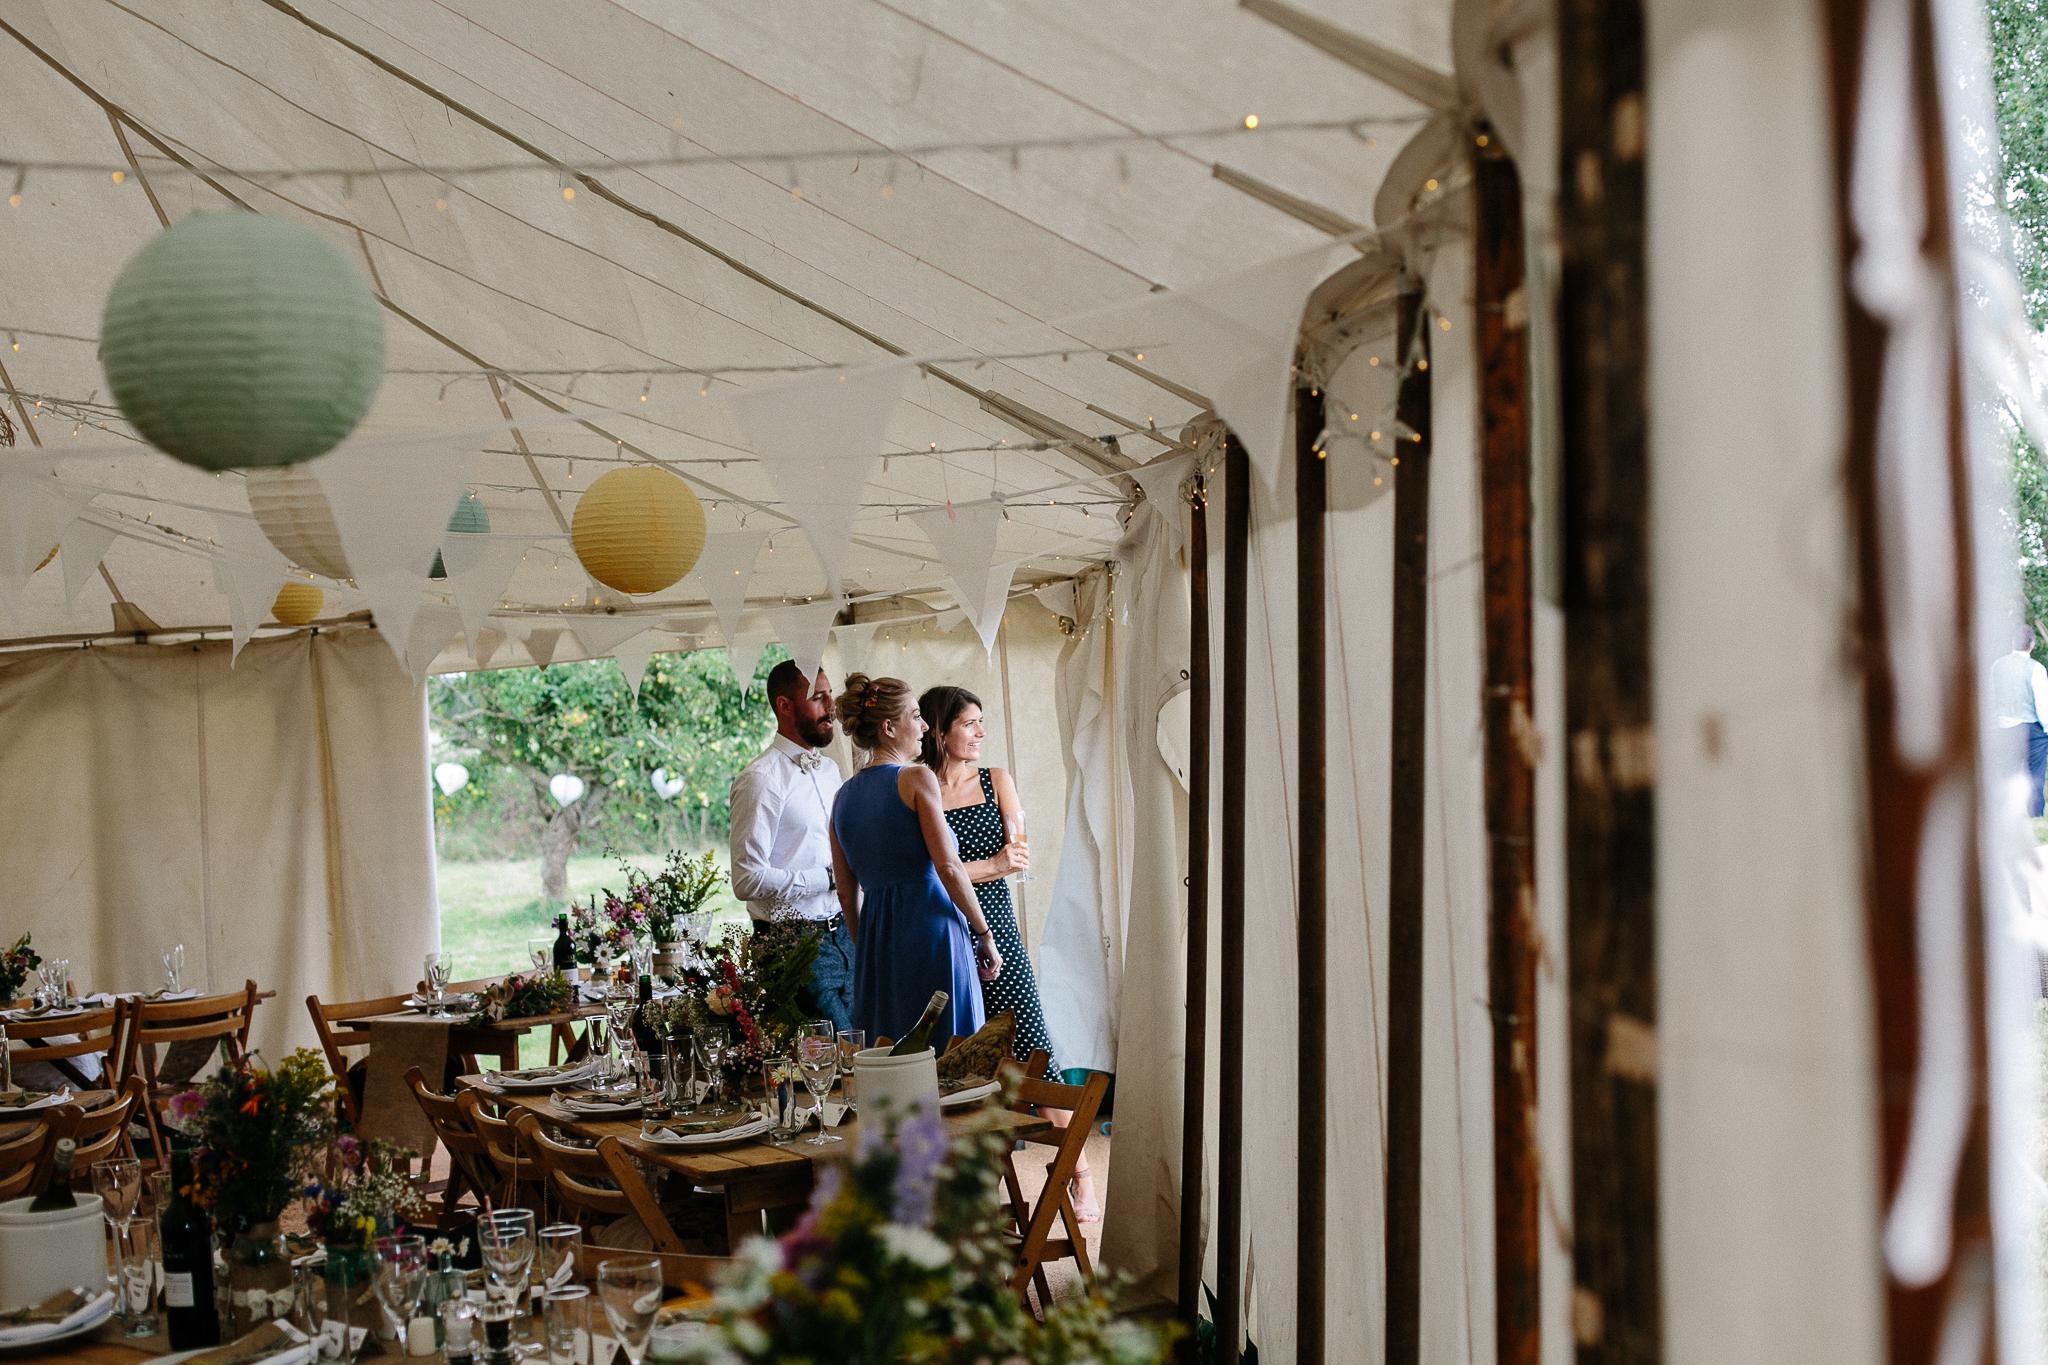 grantham_wedding_photographer-84.jpg